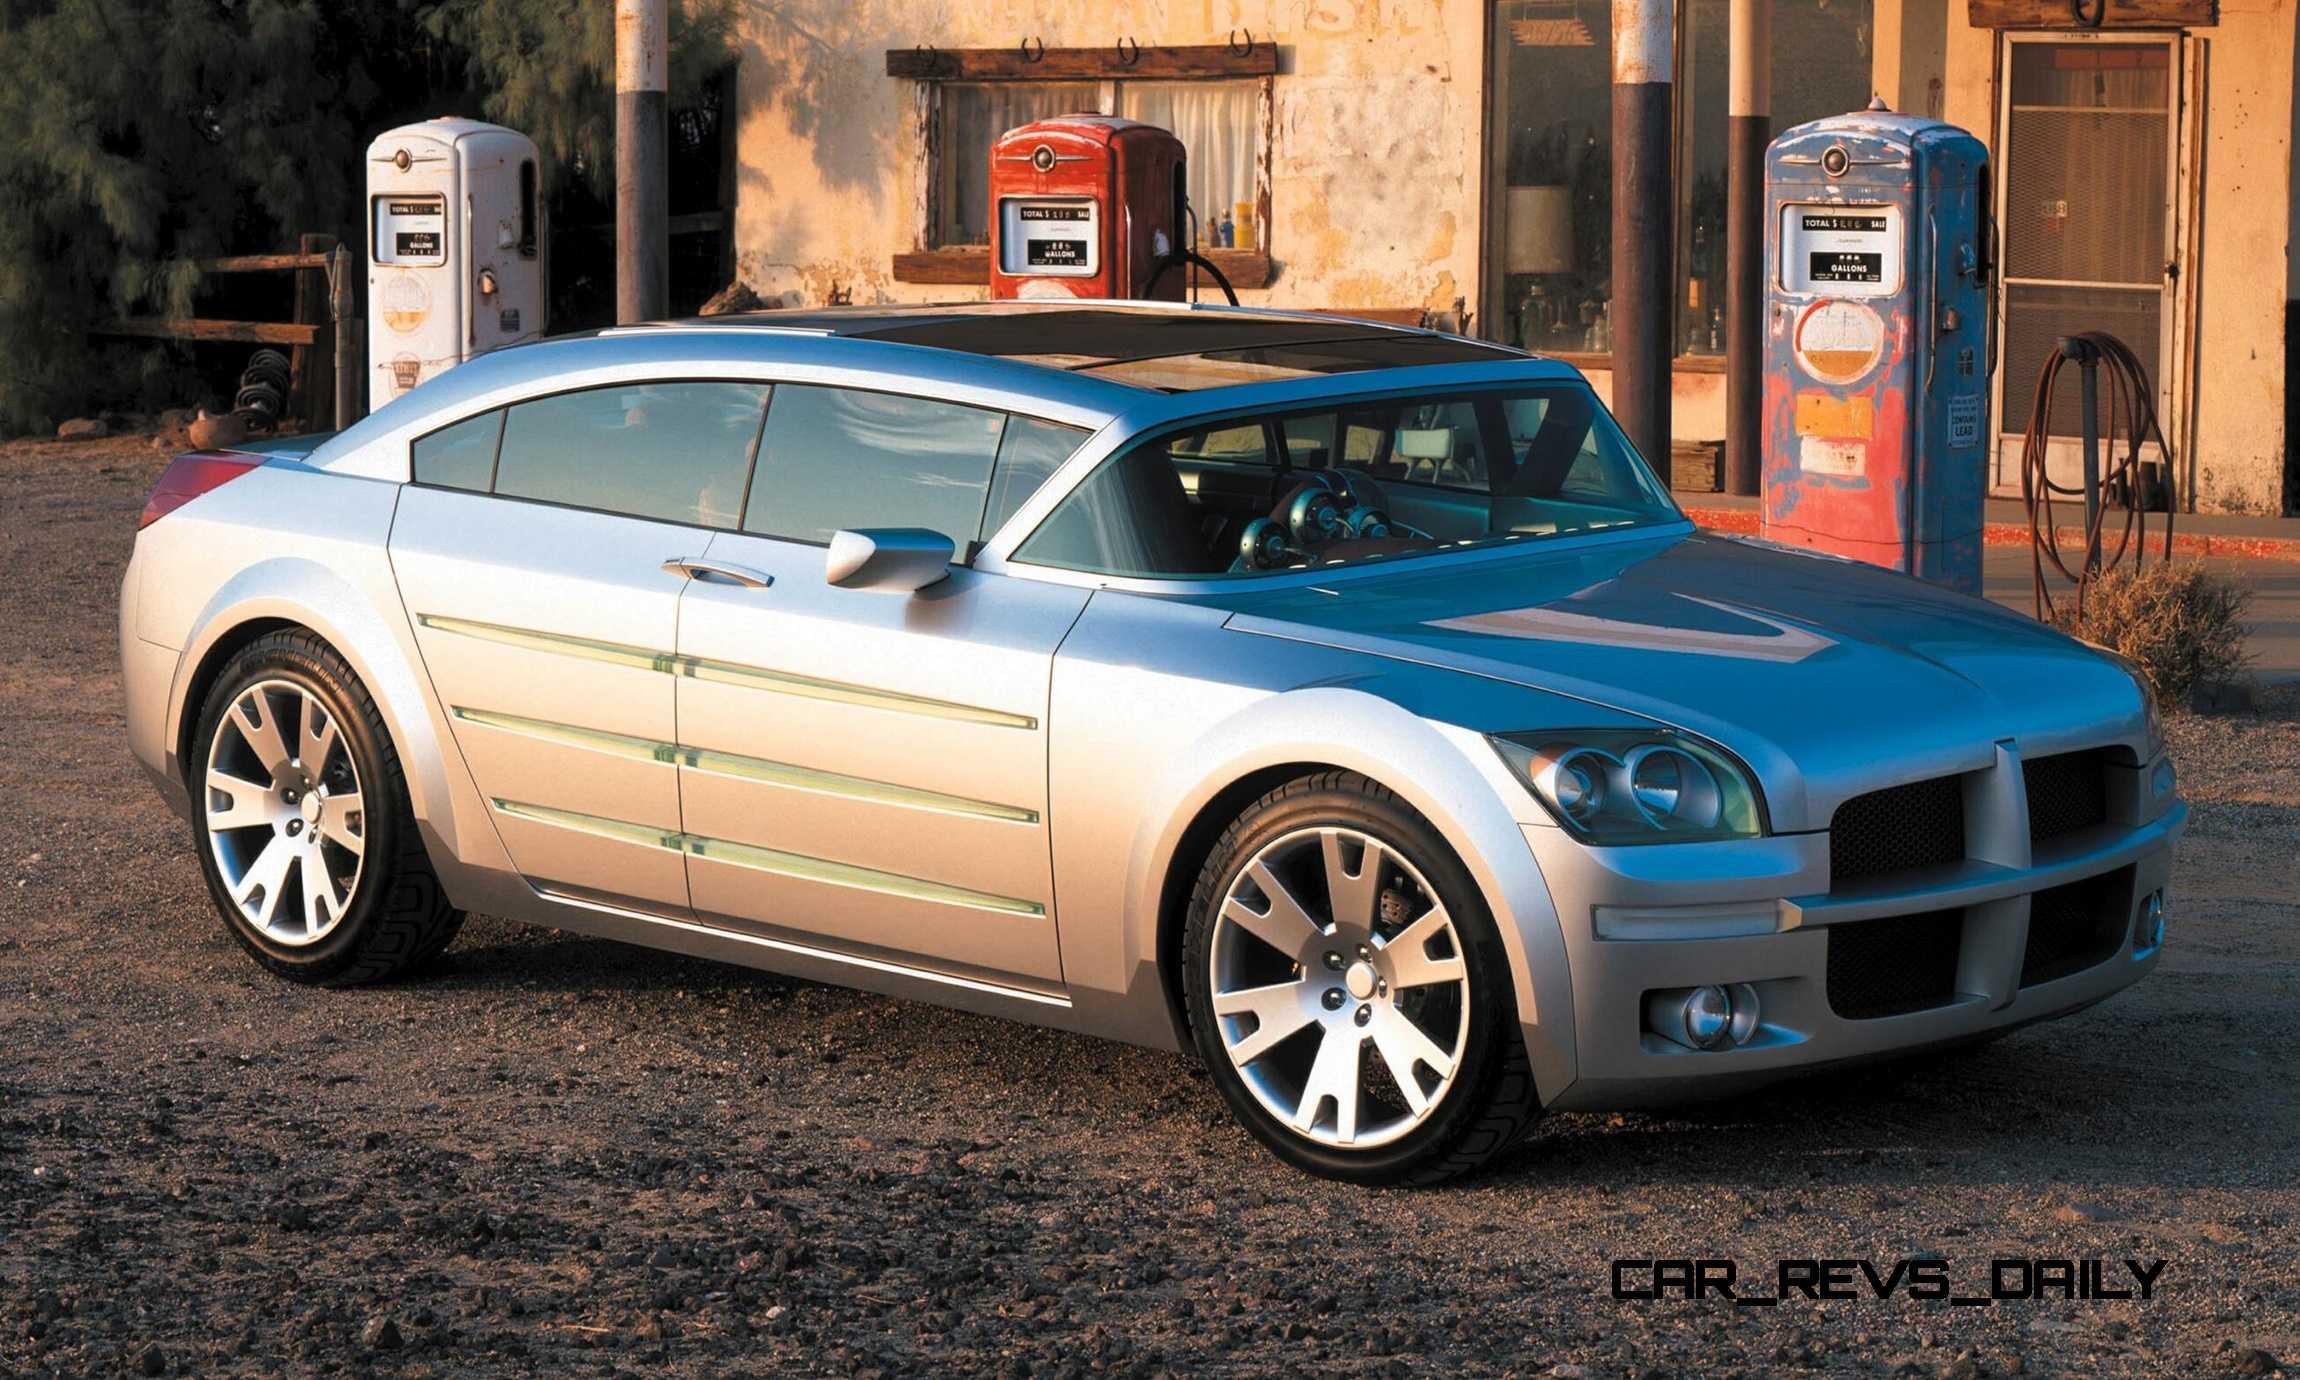 Chevy Awd Cars >> 2001 Dodge Super8 HEMI